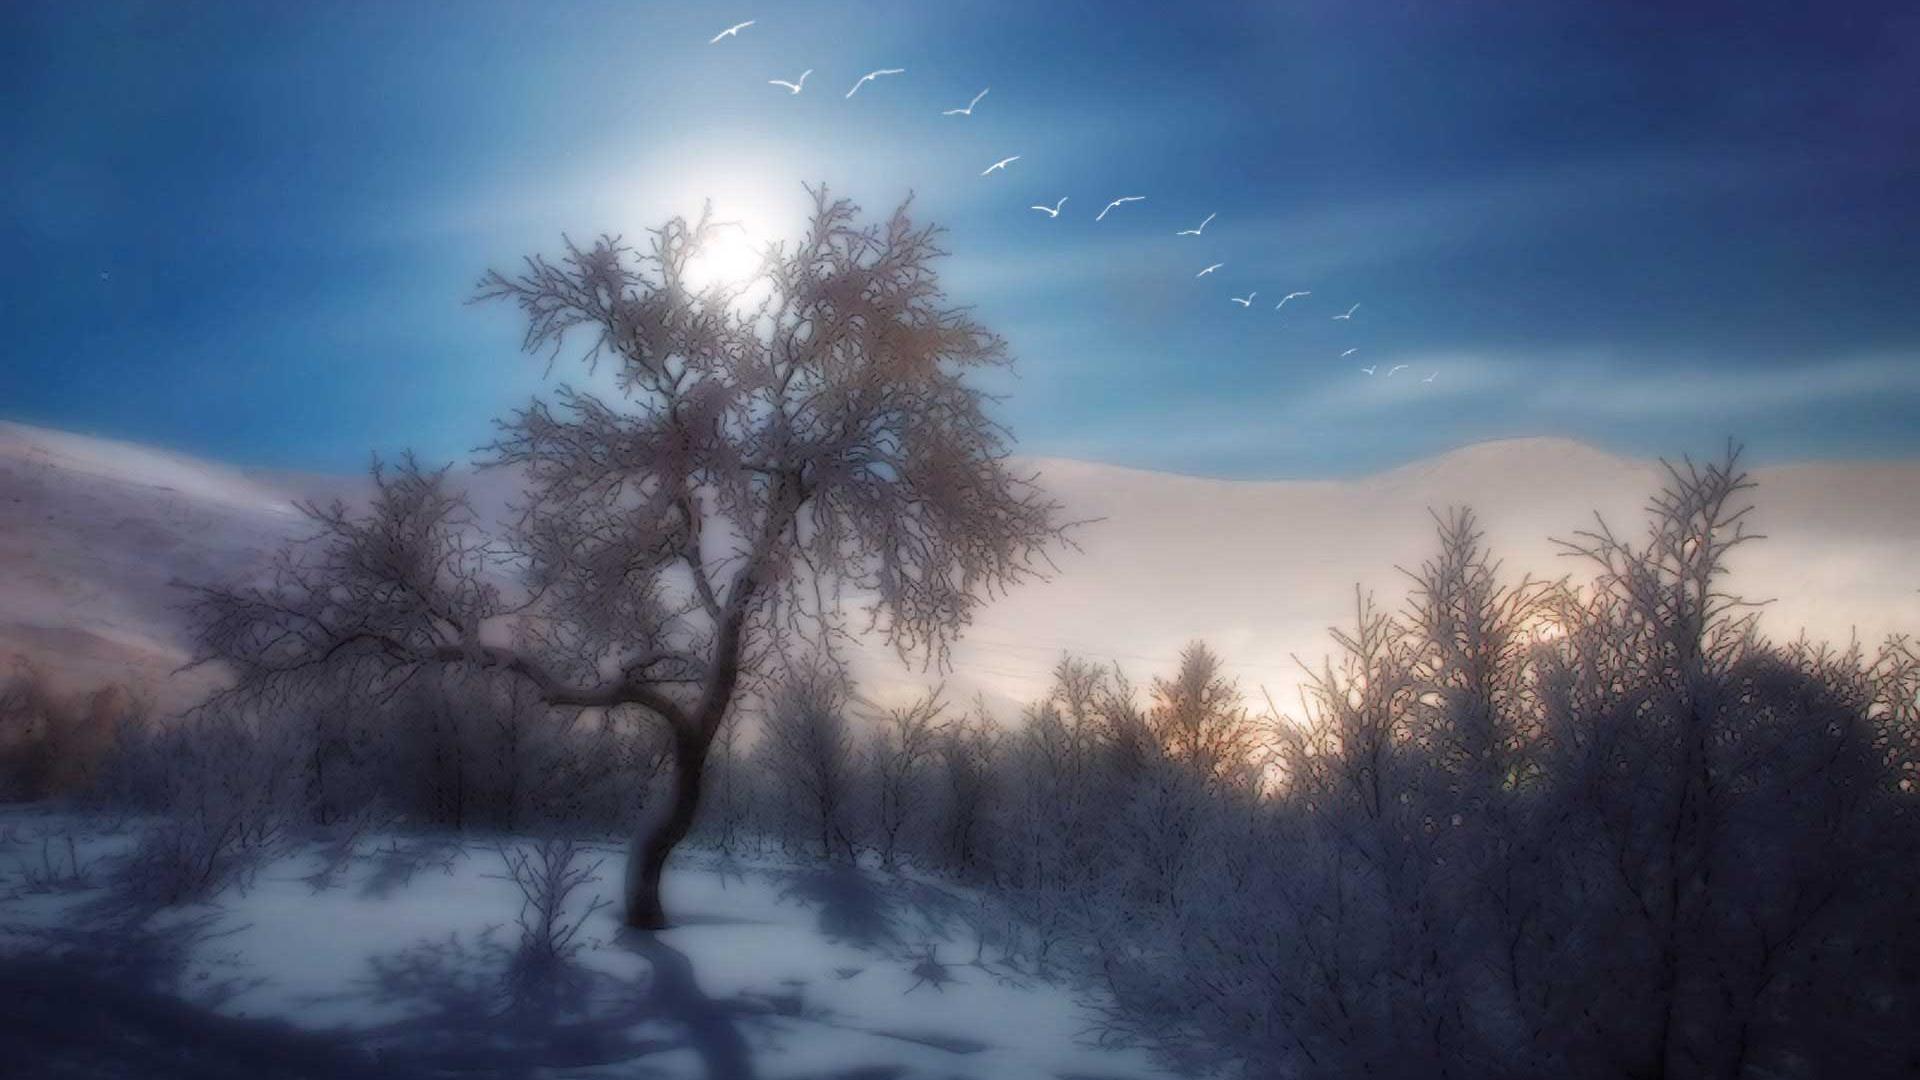 1366X768 HD Desktop Wallpapers Winter